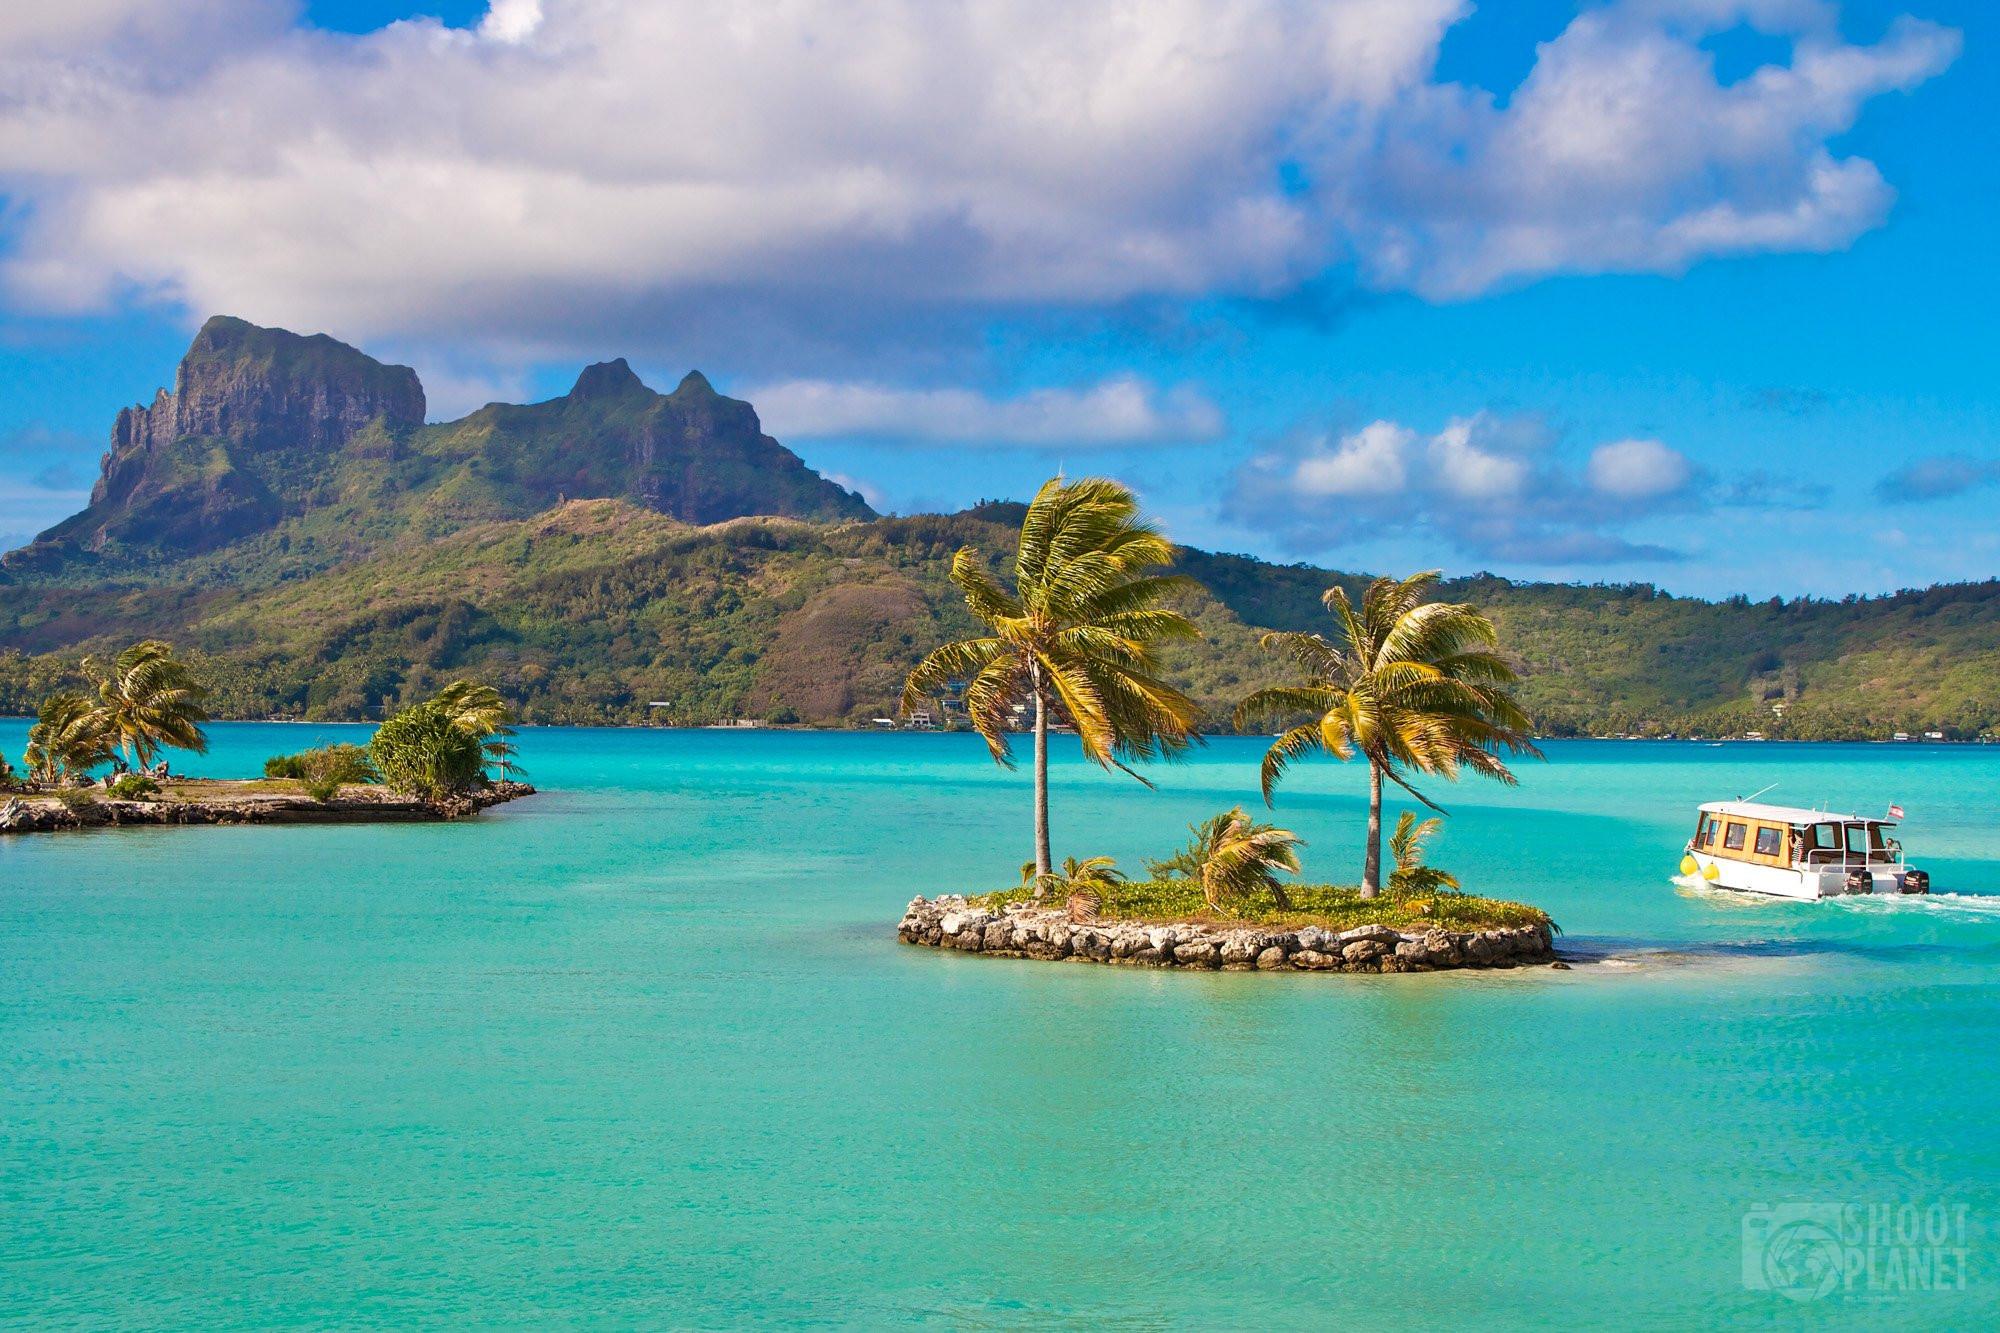 Mount Otemanu over lagoon in Bora Bora Tahiti